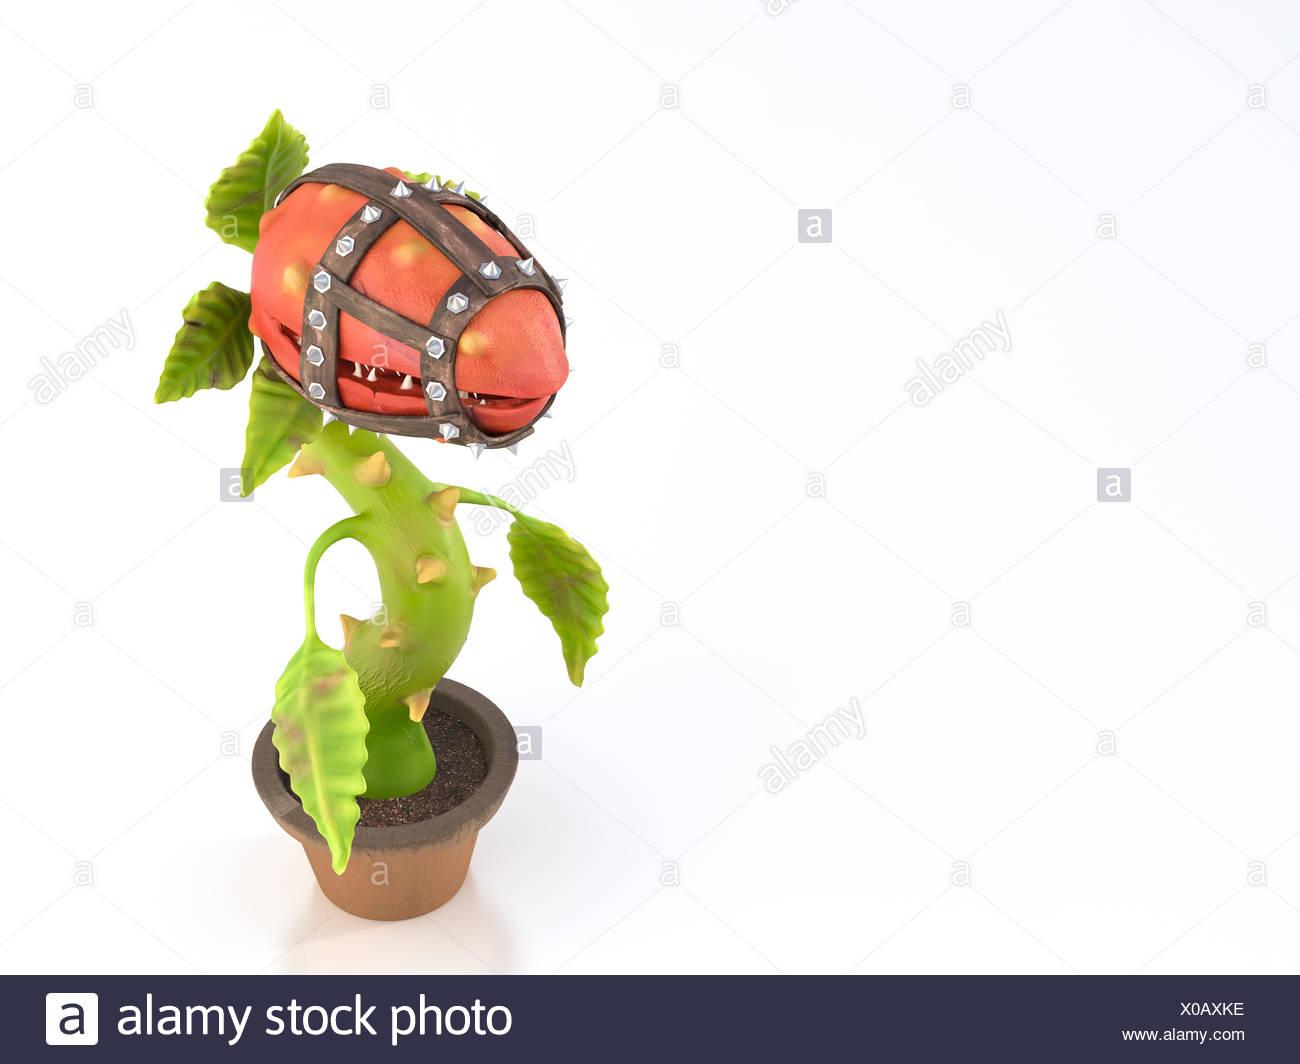 Carnivorous plant with muzzle - Stock Image